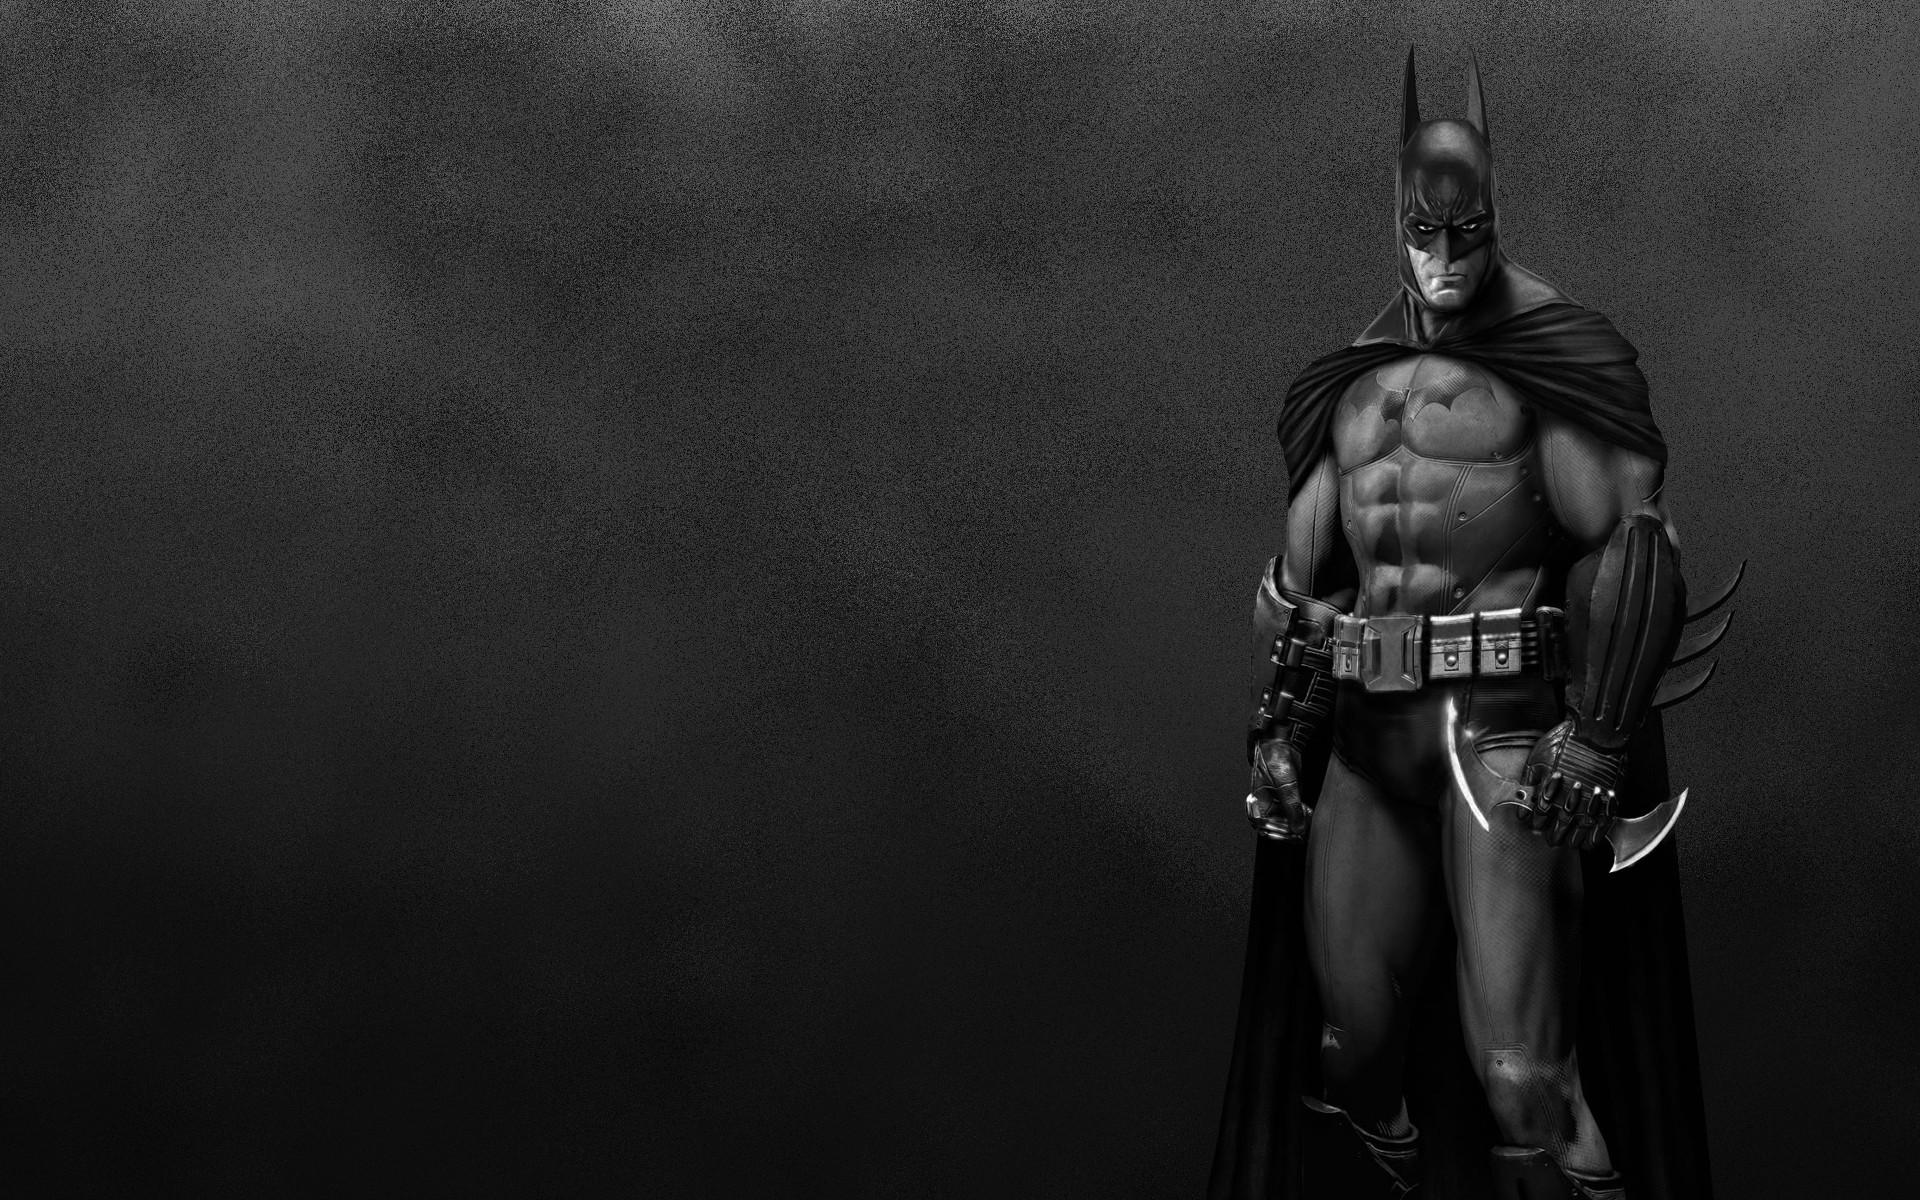 Batman wallpaper download now